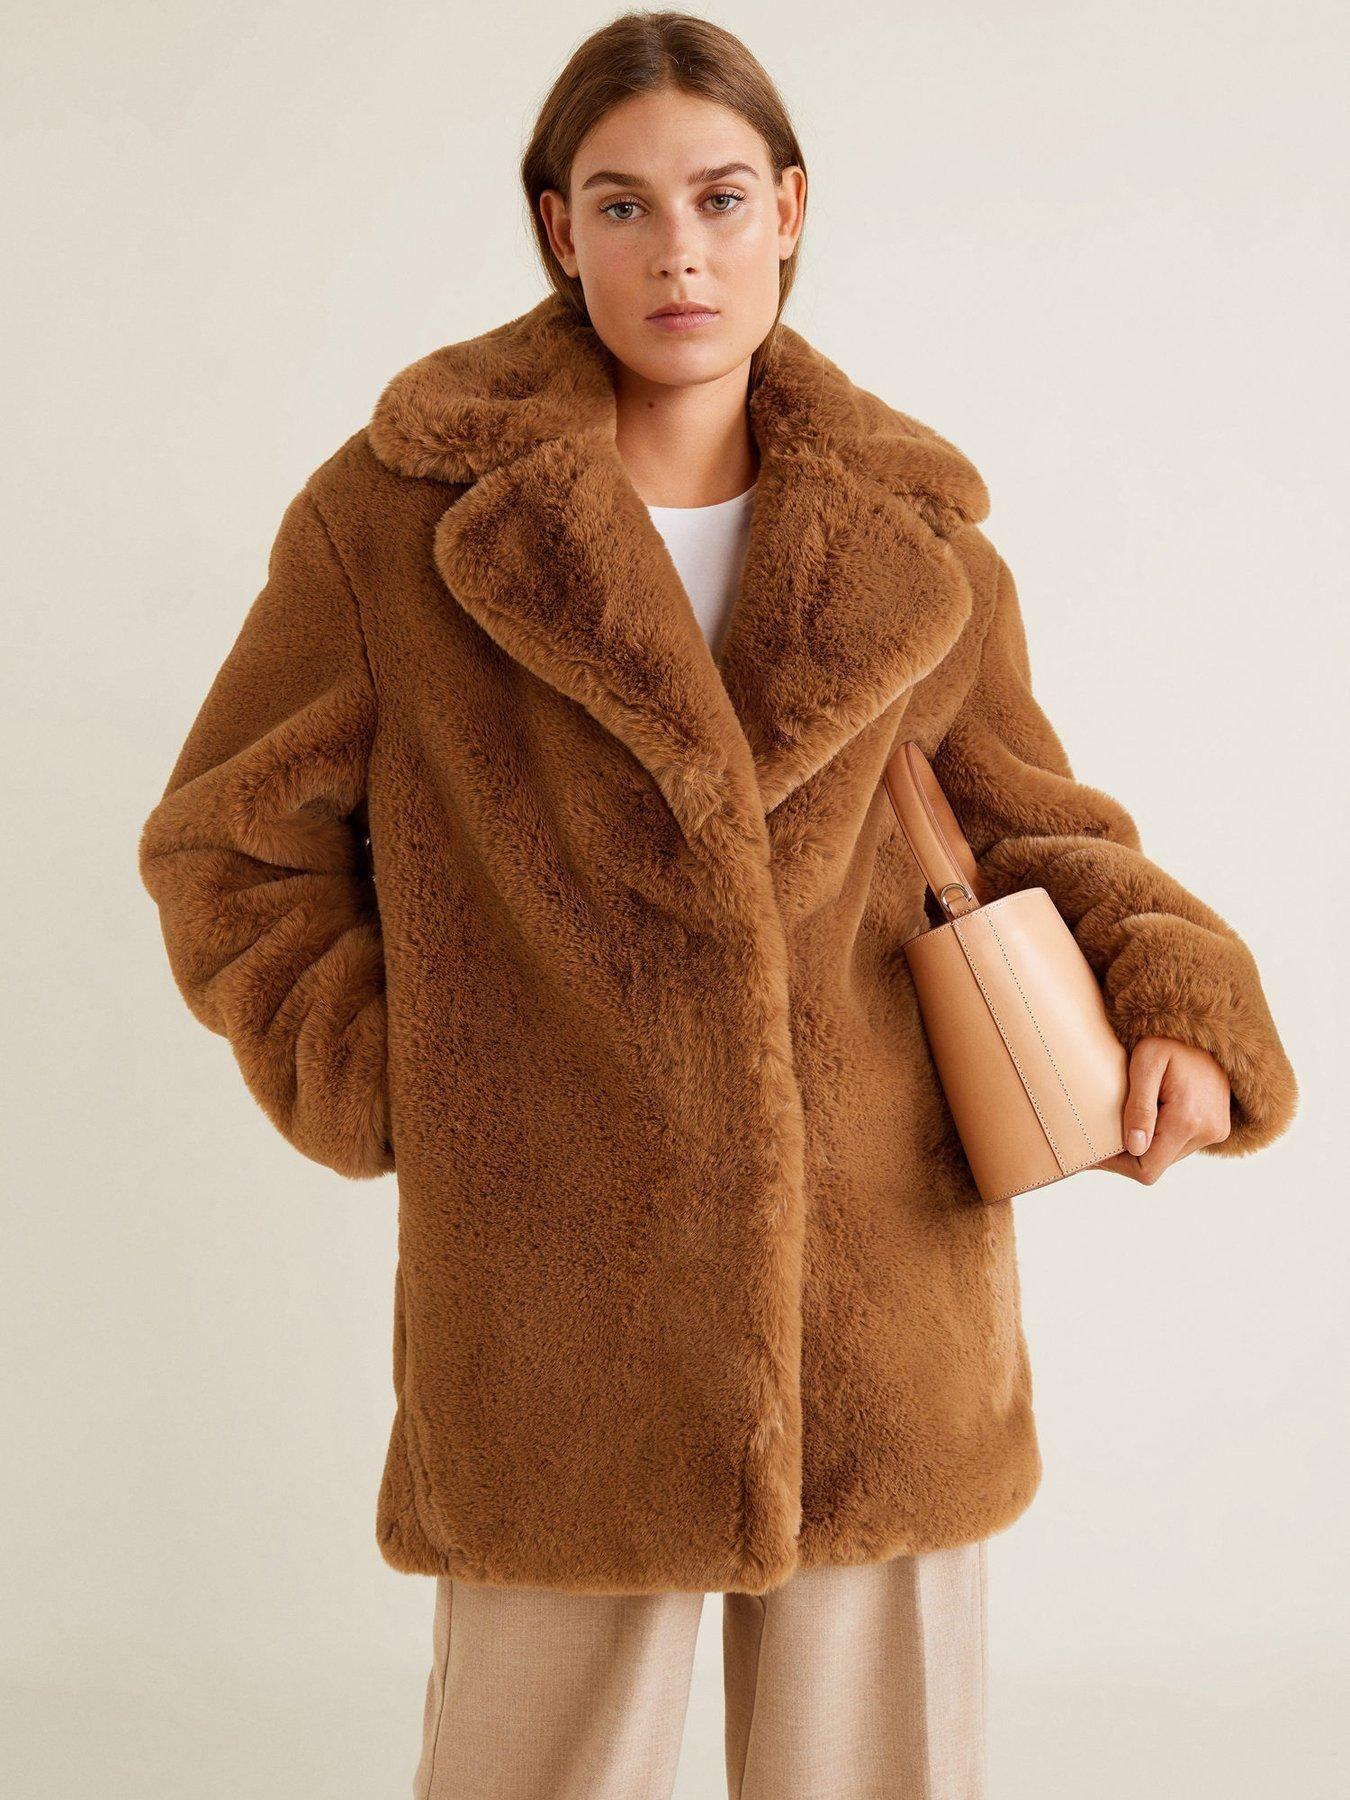 Littlewoods Ireland Online Shopping Fashion Homeware Womens Faux Fur Coat Brown Faux Fur Coat Fur Coats Women